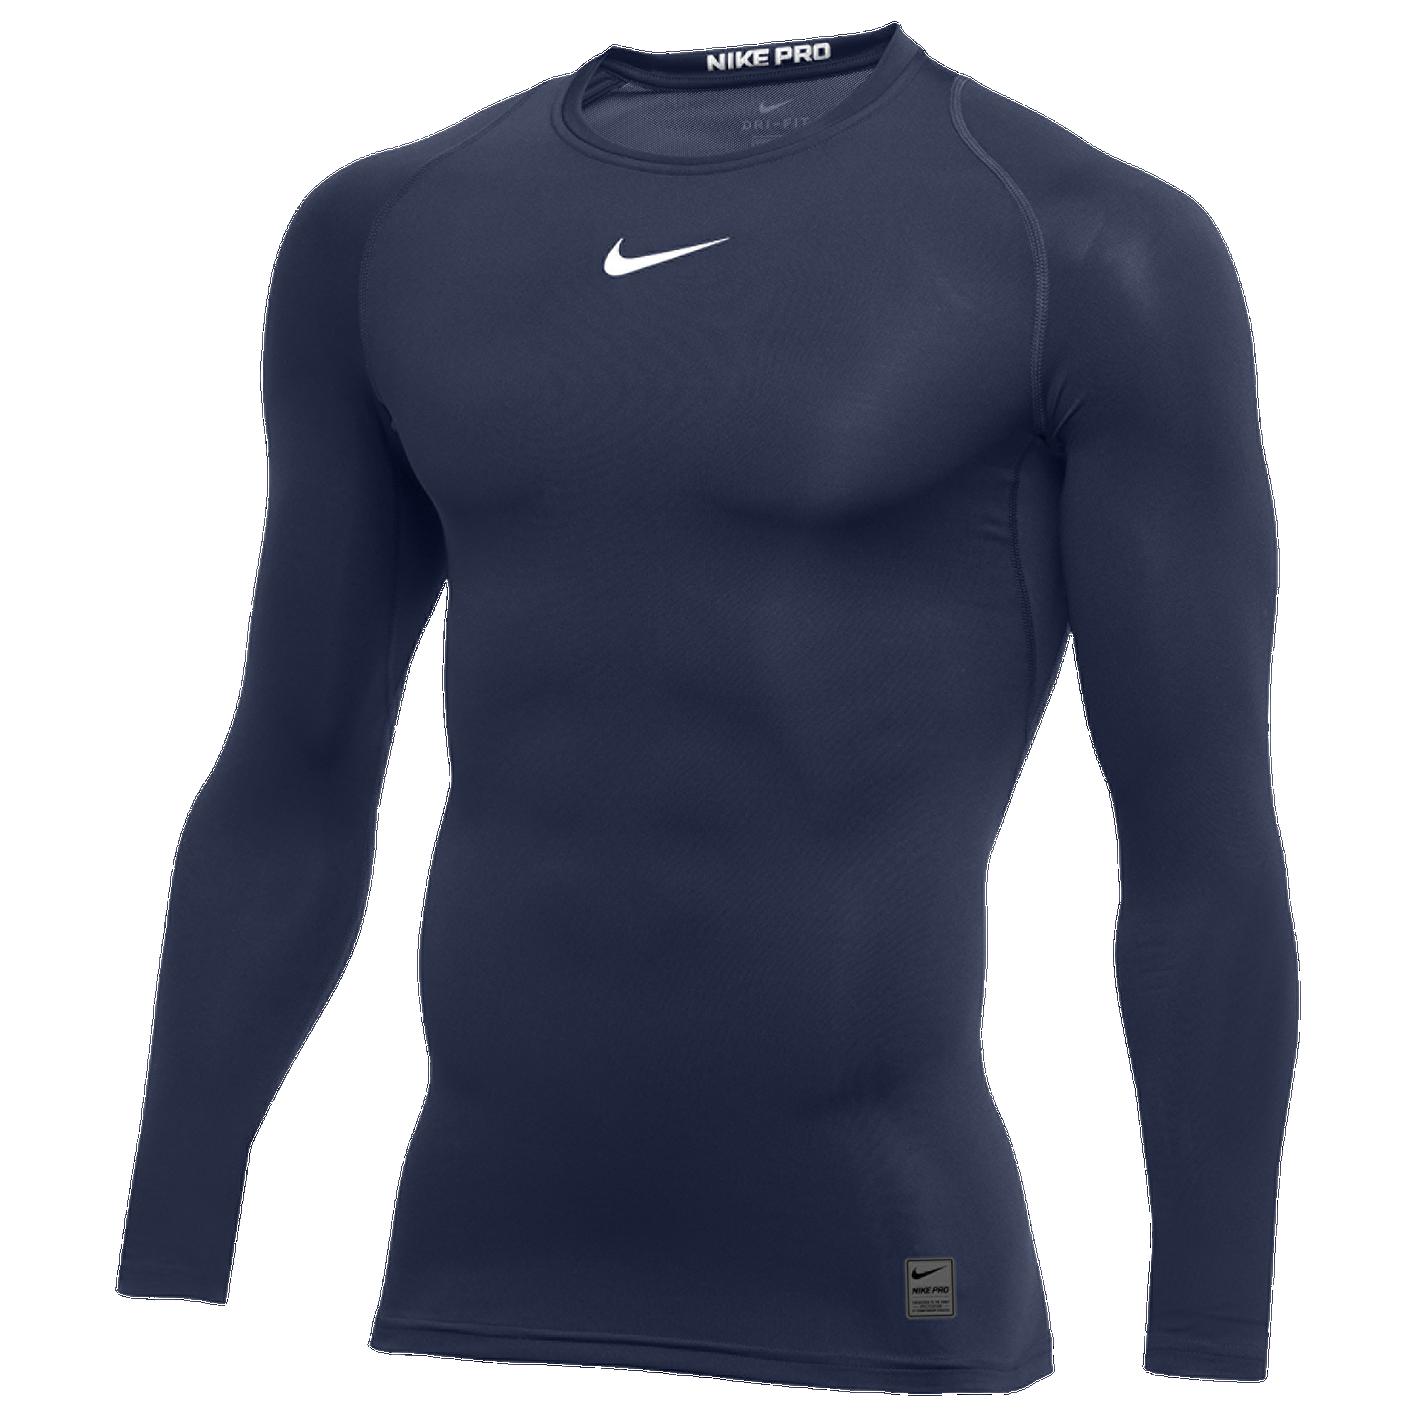 a2de8b06 Nike Pro Long Sleeve Compression Top - Men's - Baseball - Clothing ...